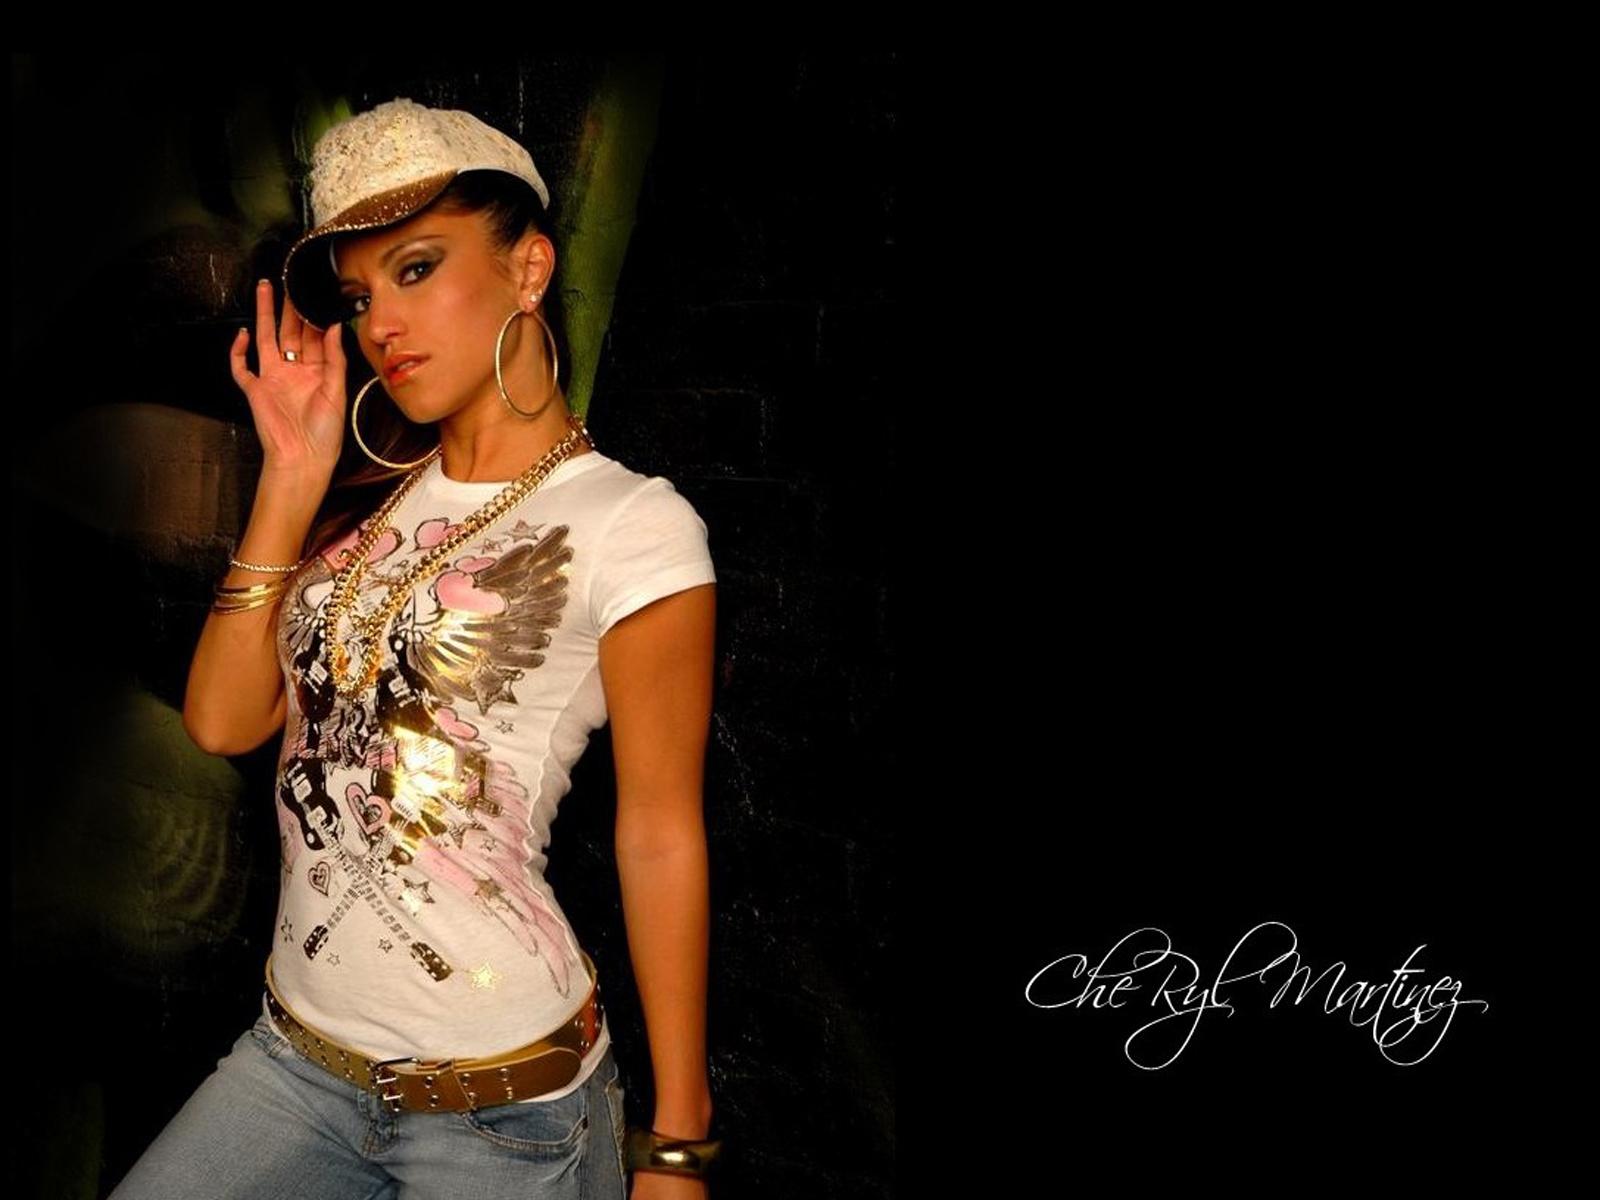 http://2.bp.blogspot.com/_5ztkH_naciY/TMr3KyvwAWI/AAAAAAAAAA8/FEZlhgtJV_c/s1600/hiphop_wallpaper_1600.jpg